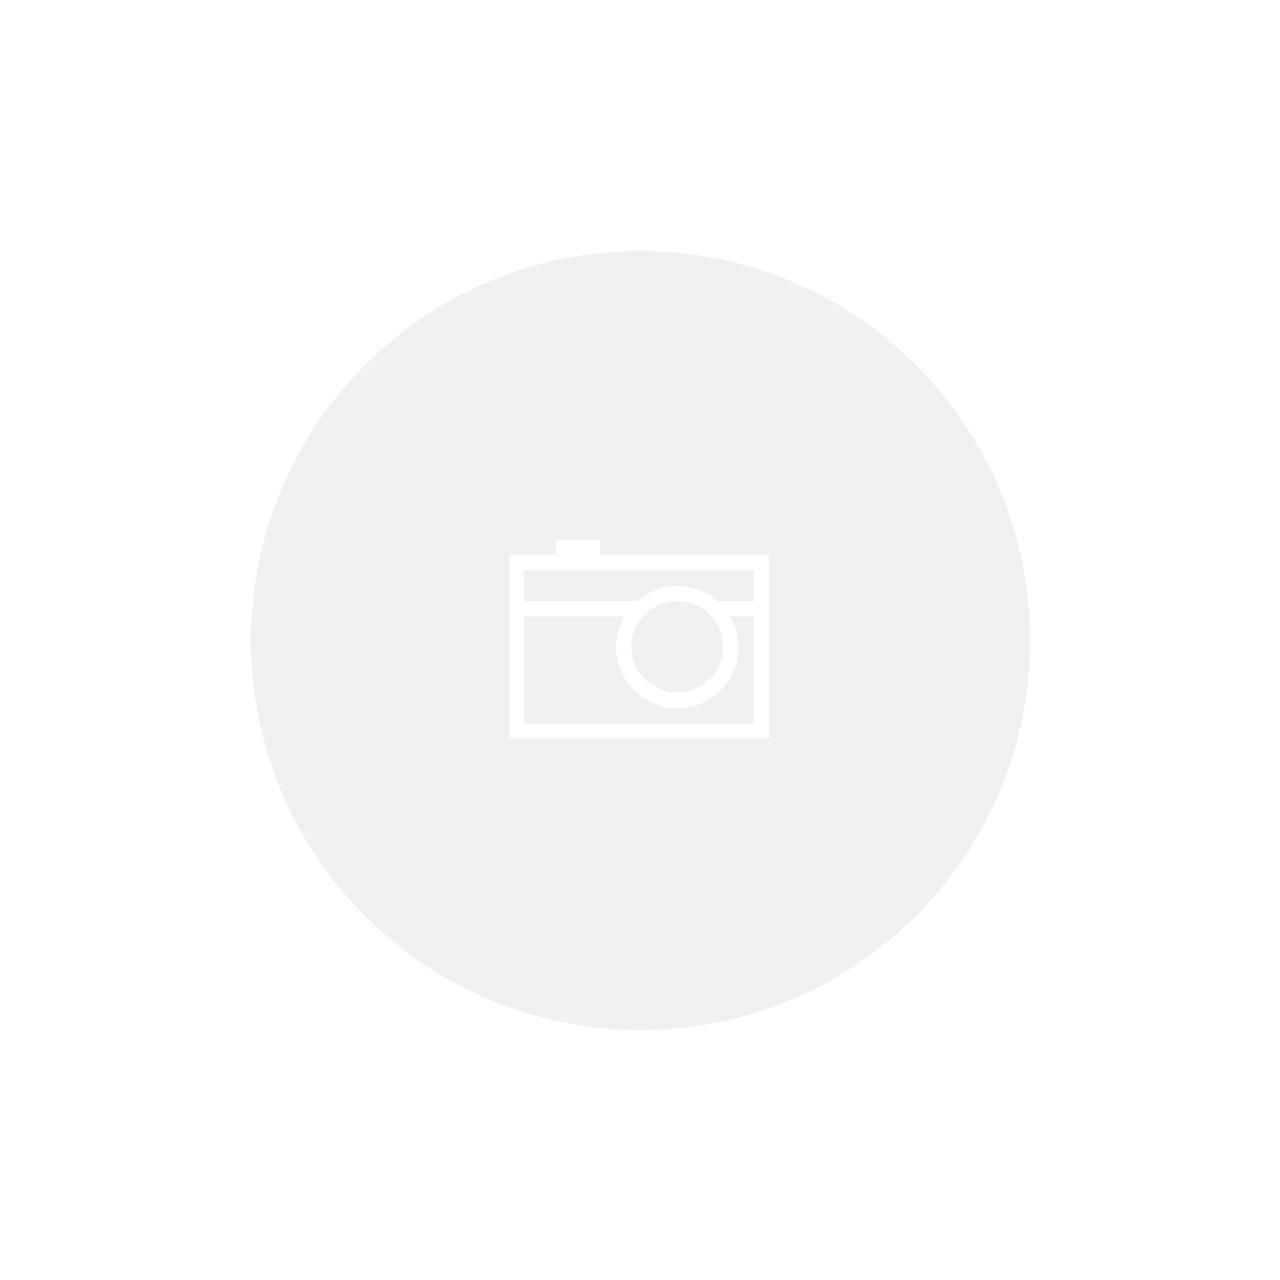 Blusa Elaborada I Serigrafada 001VF17